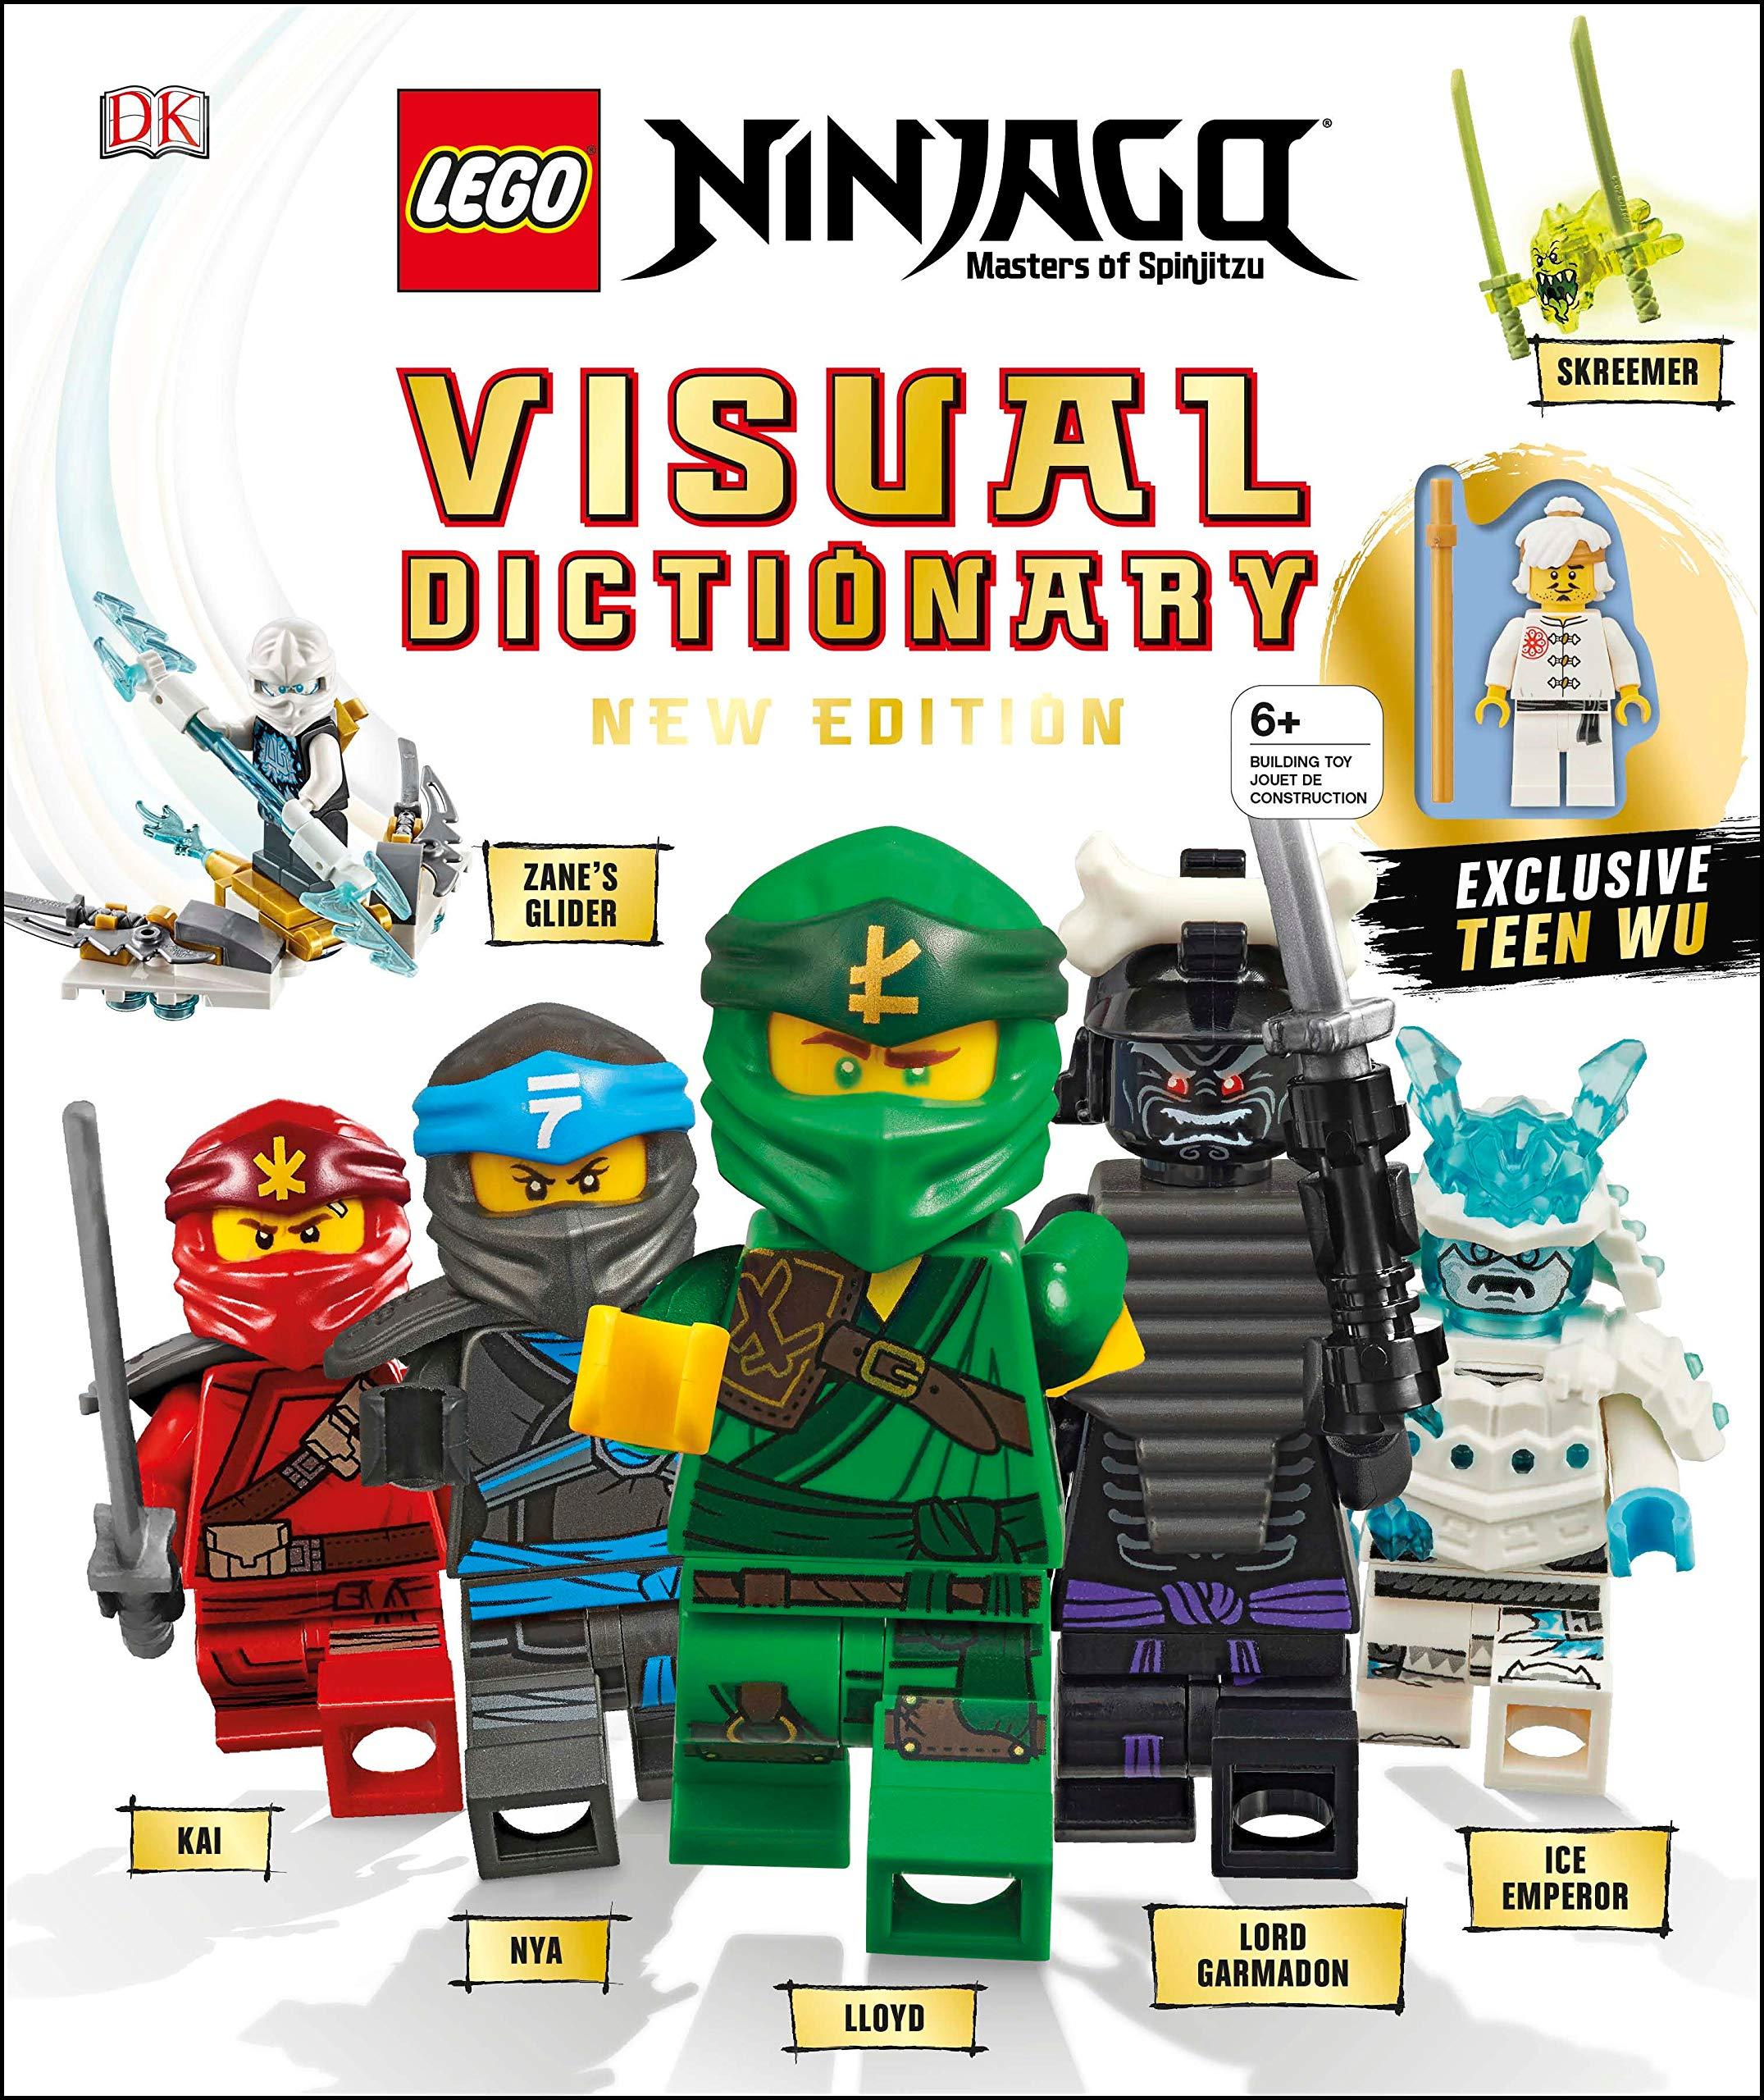 LEGO Ninjago Visual Dictionary - New Edition Pre-Order - The